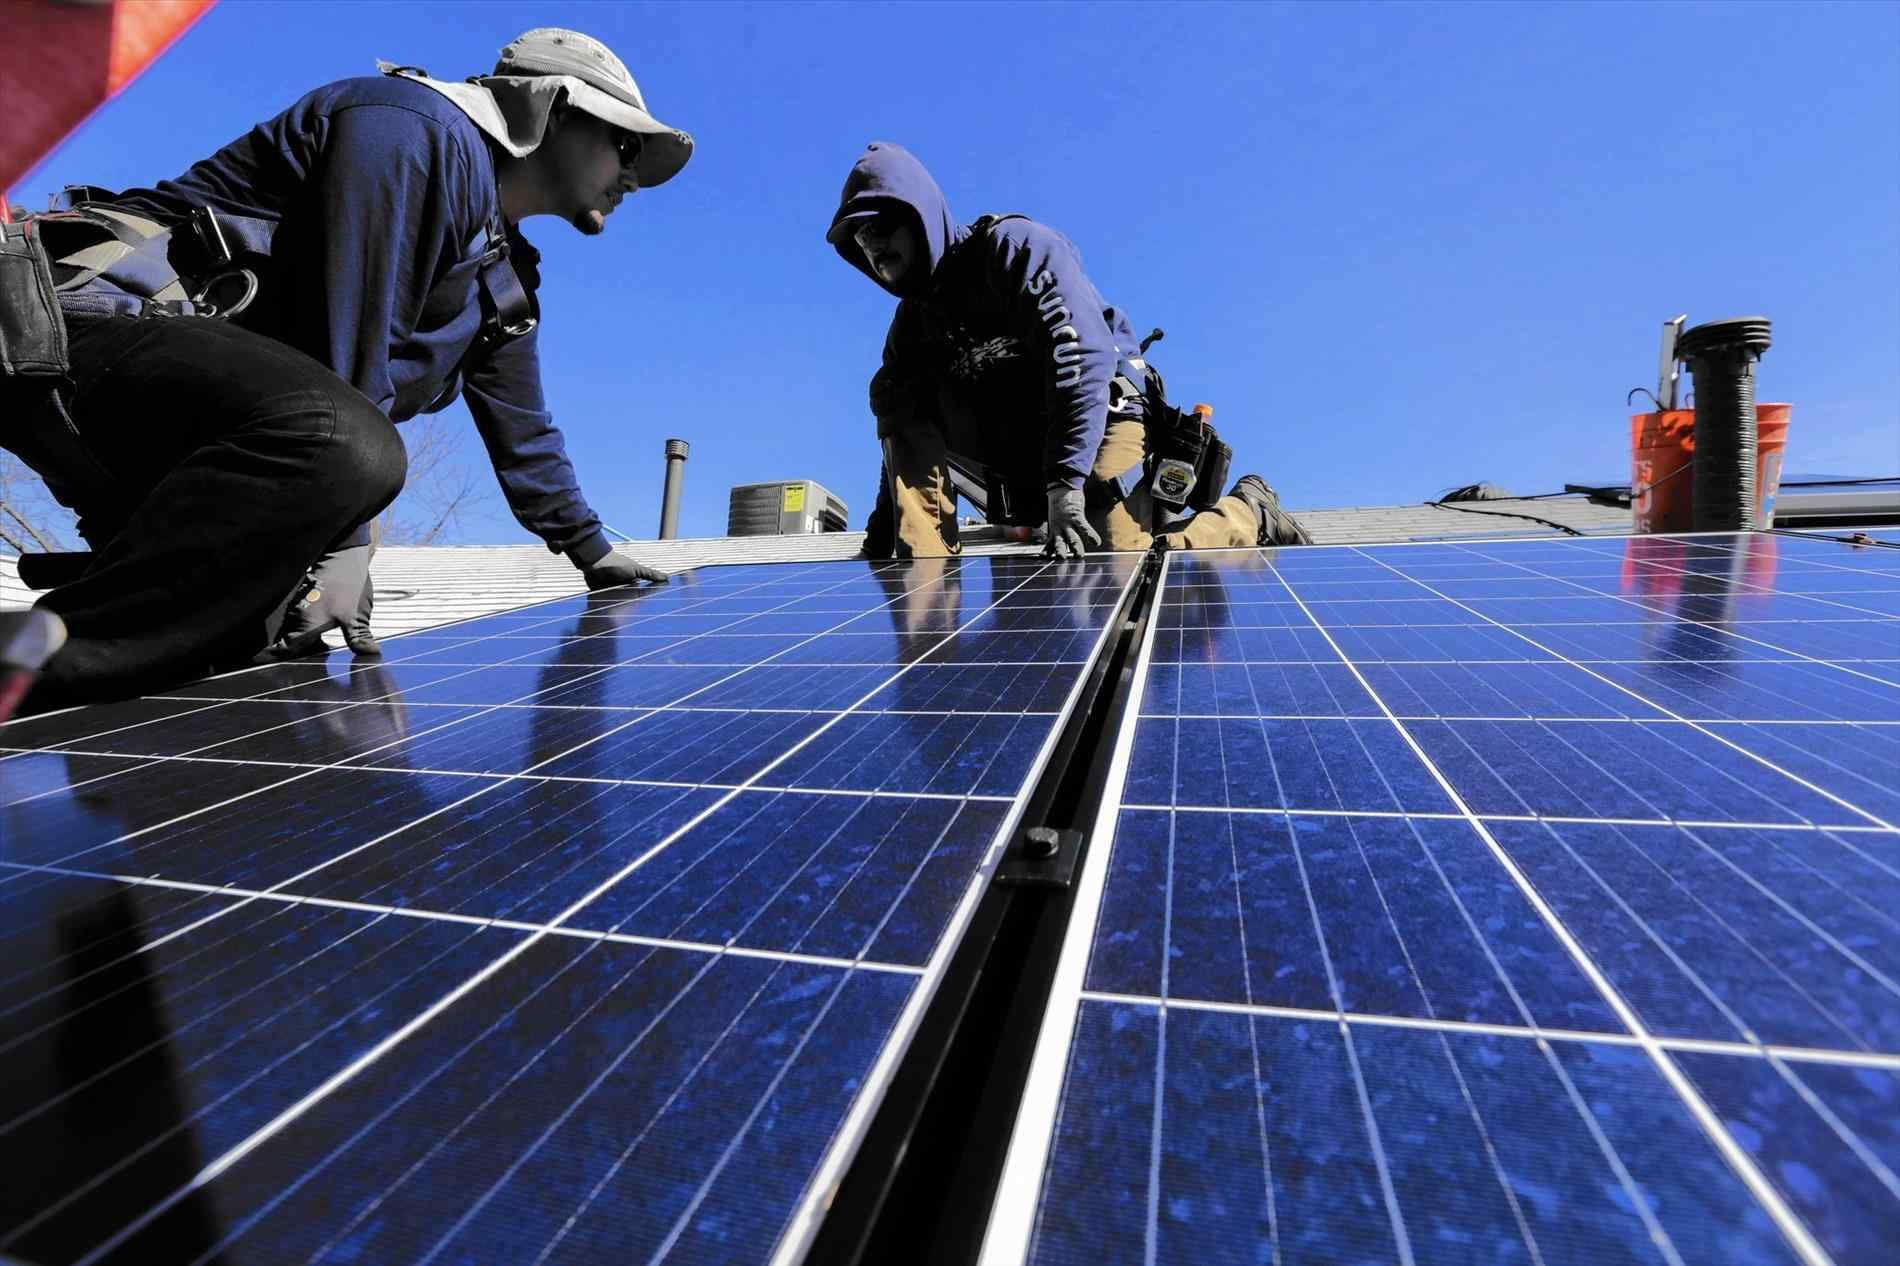 pin by edoem on best solar panels in los angeles pinterest solar